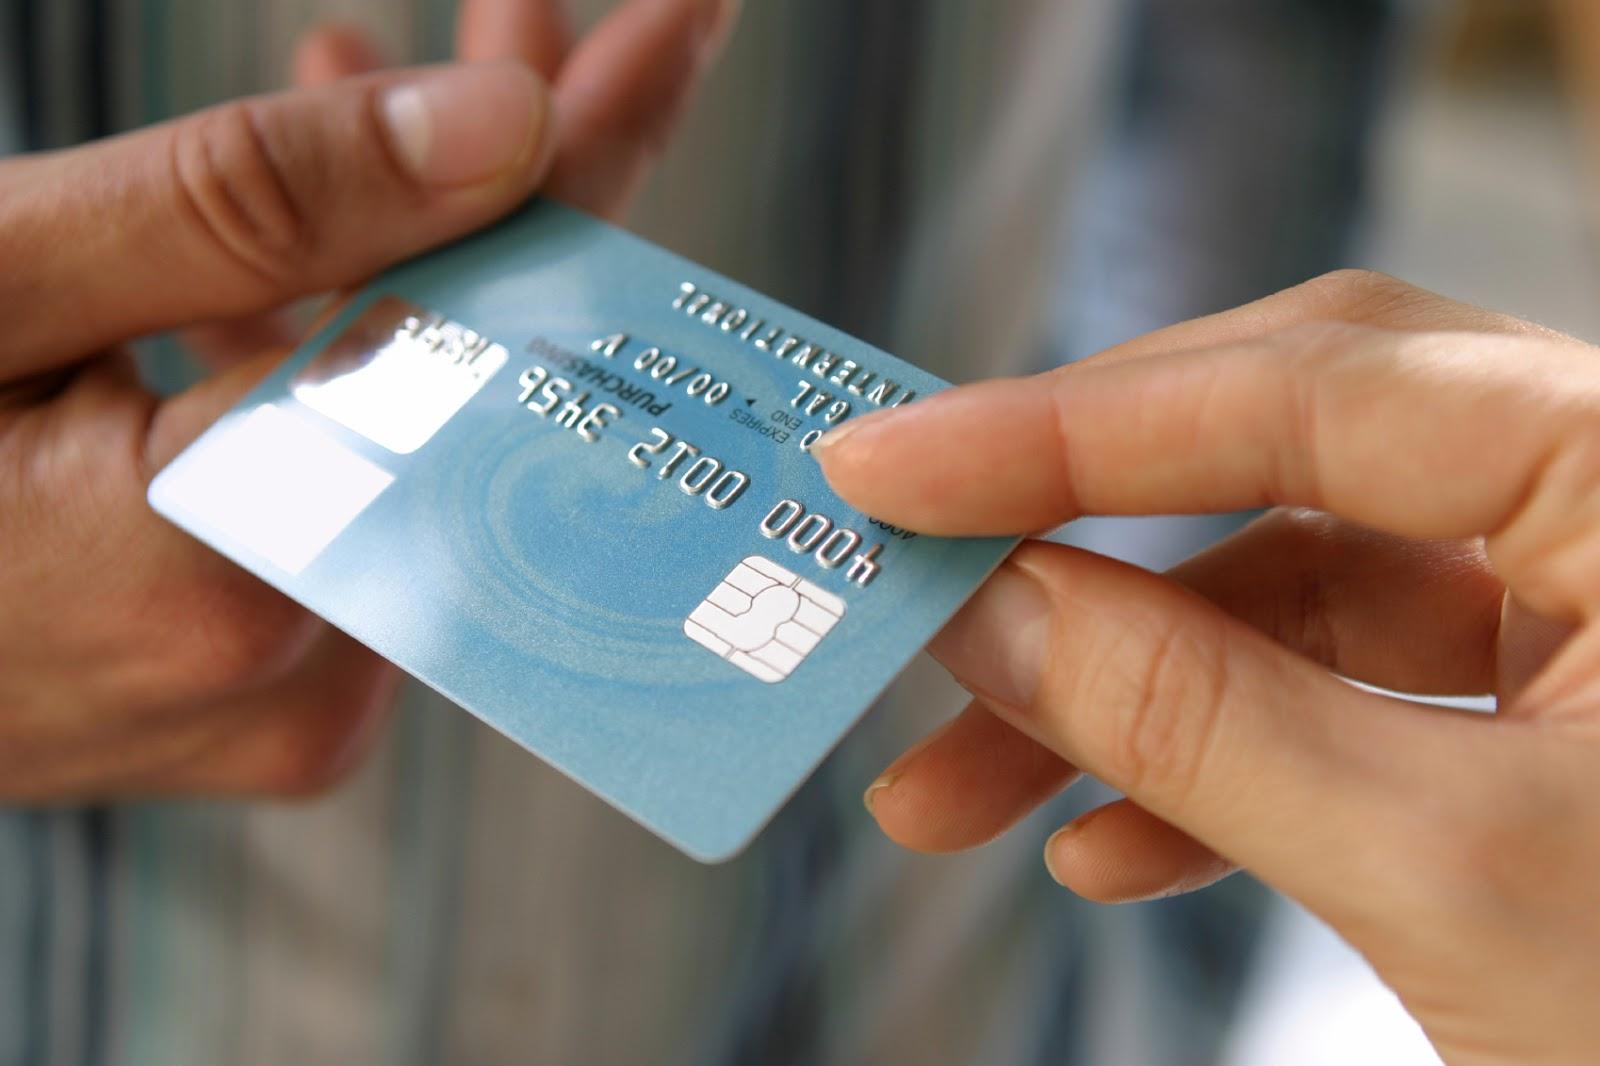 kreditnaya-karta-s-ploxoj-kreditnoj-istoriej_5